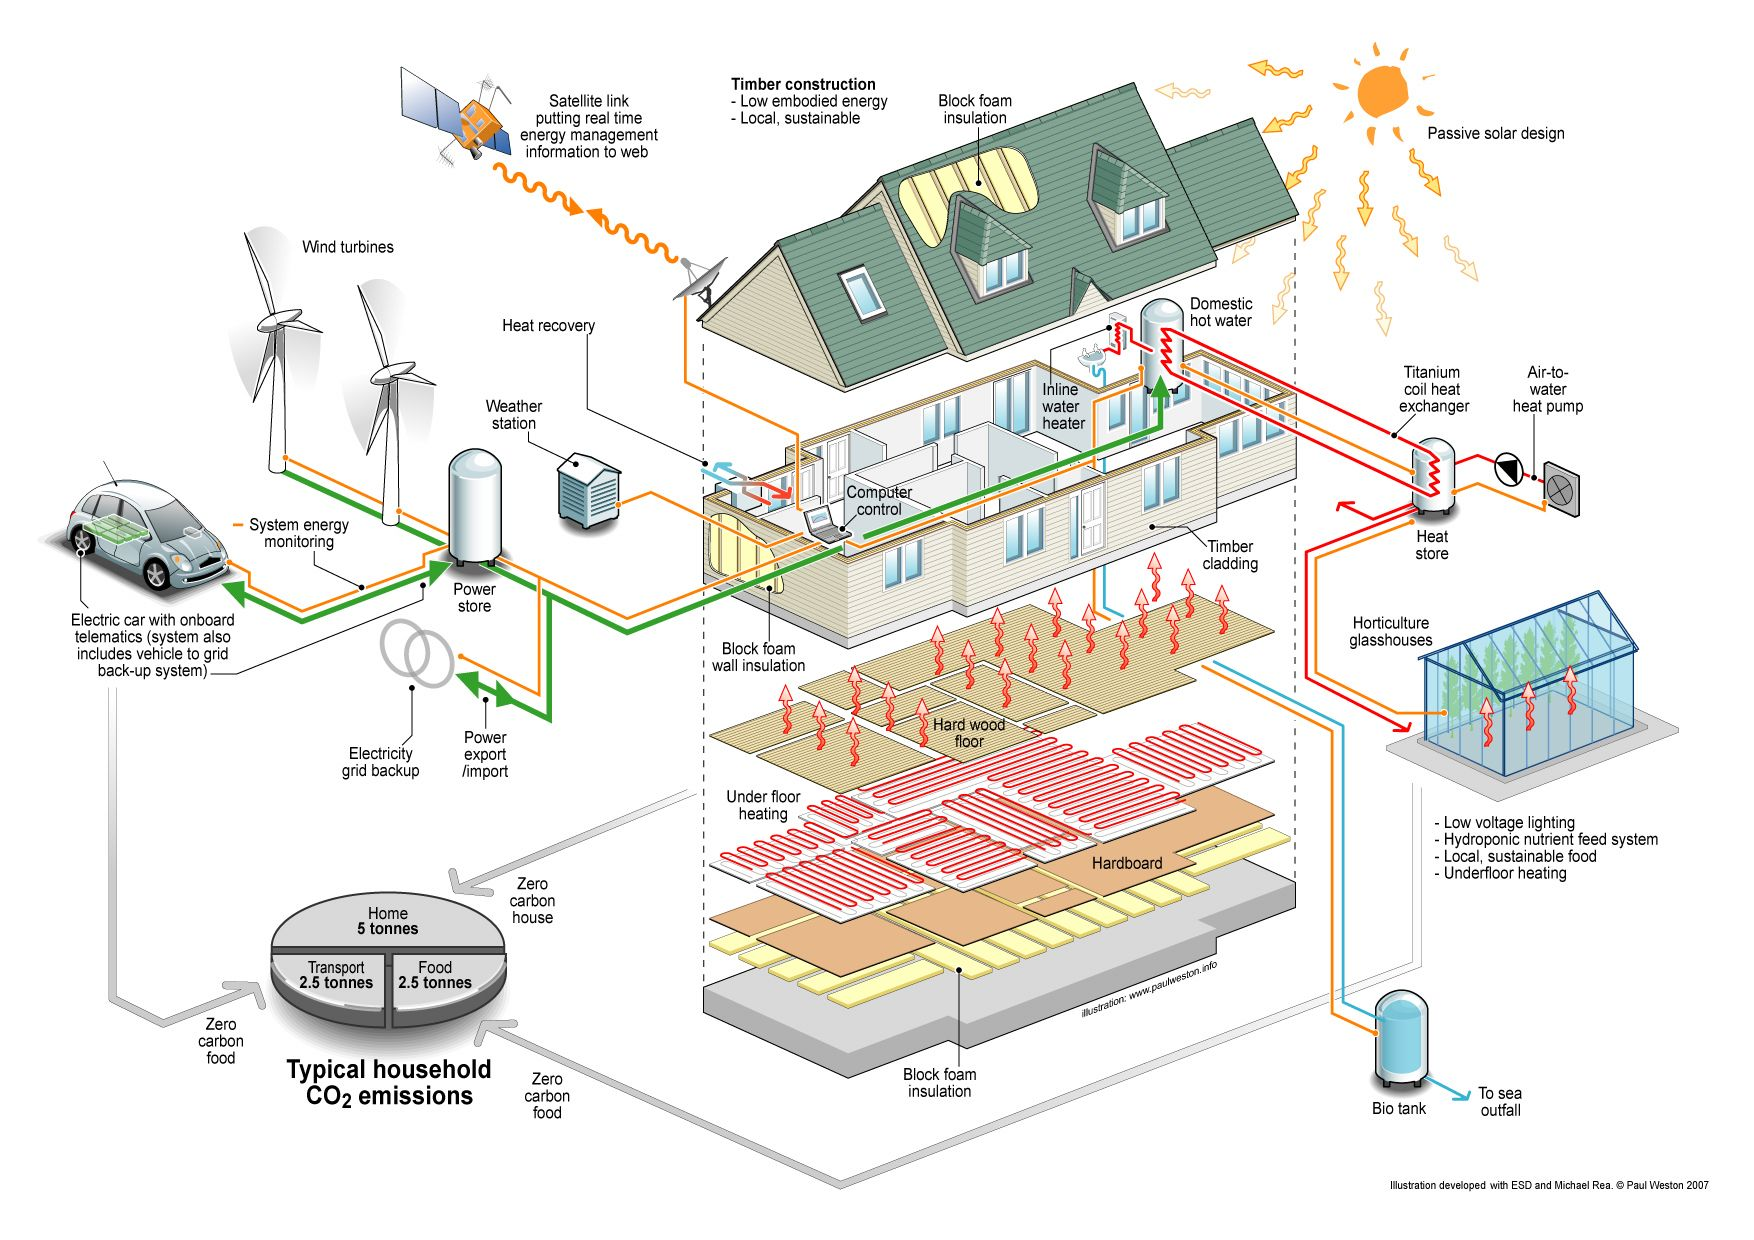 Hurst Boiler Piping Diagrams Wiring Diagram Zero Carbon House Schematic Sustain En Able Pinterest Com Wood 1754x1240